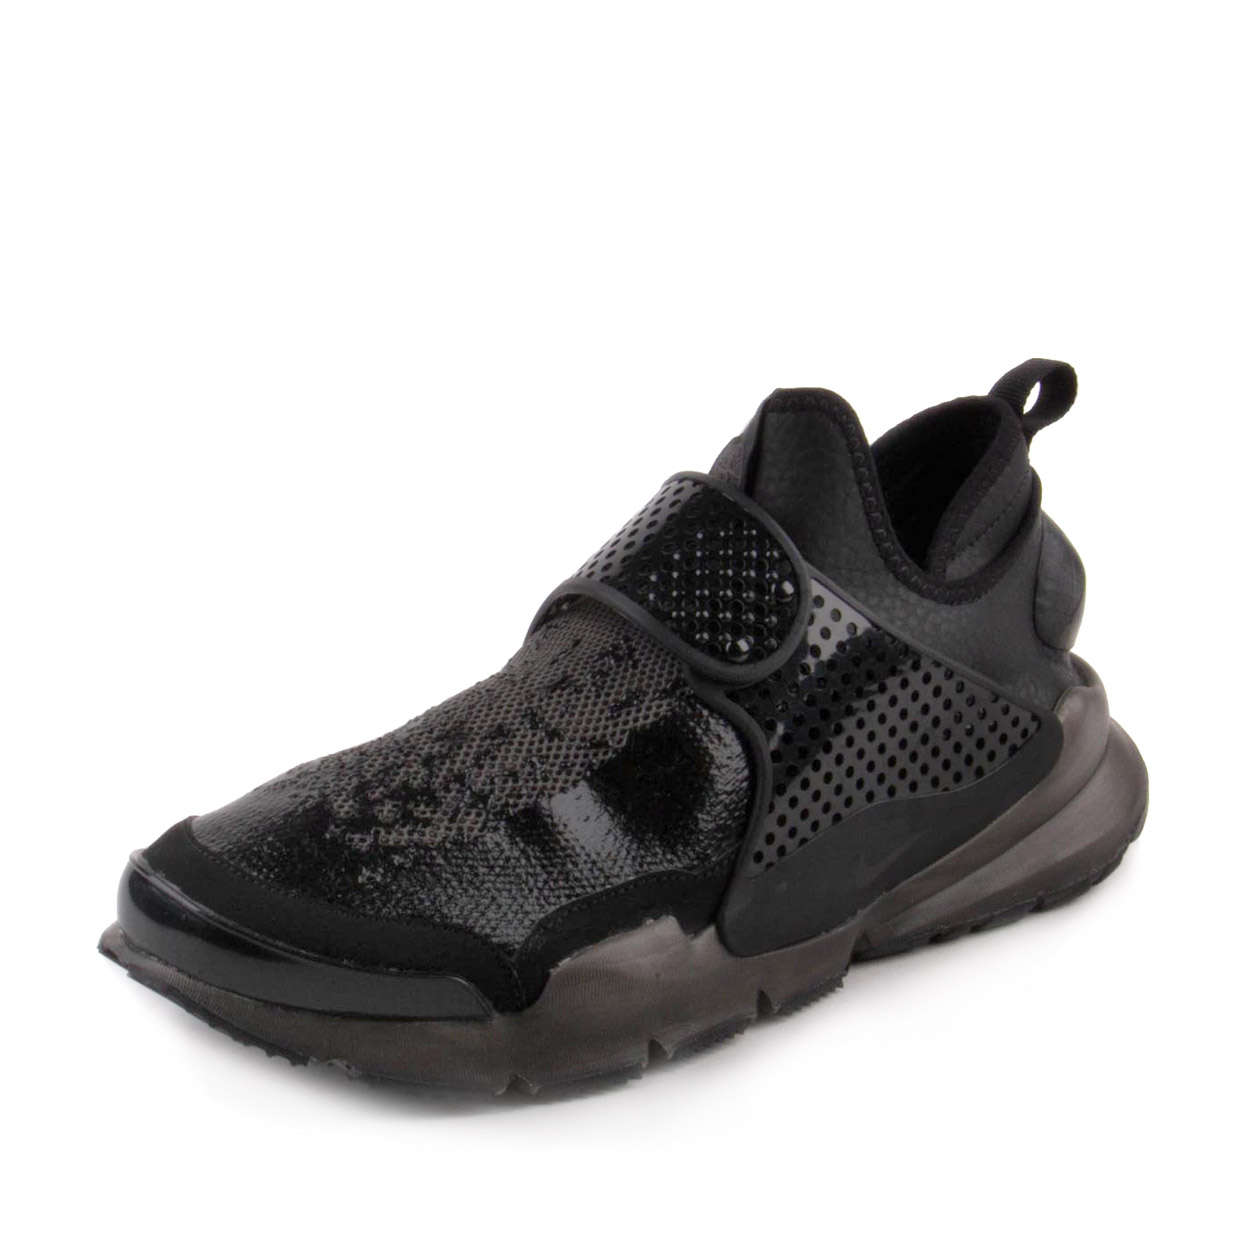 Nike Mens Stone Island Sock Dart Mid Black/Sail 910090-001